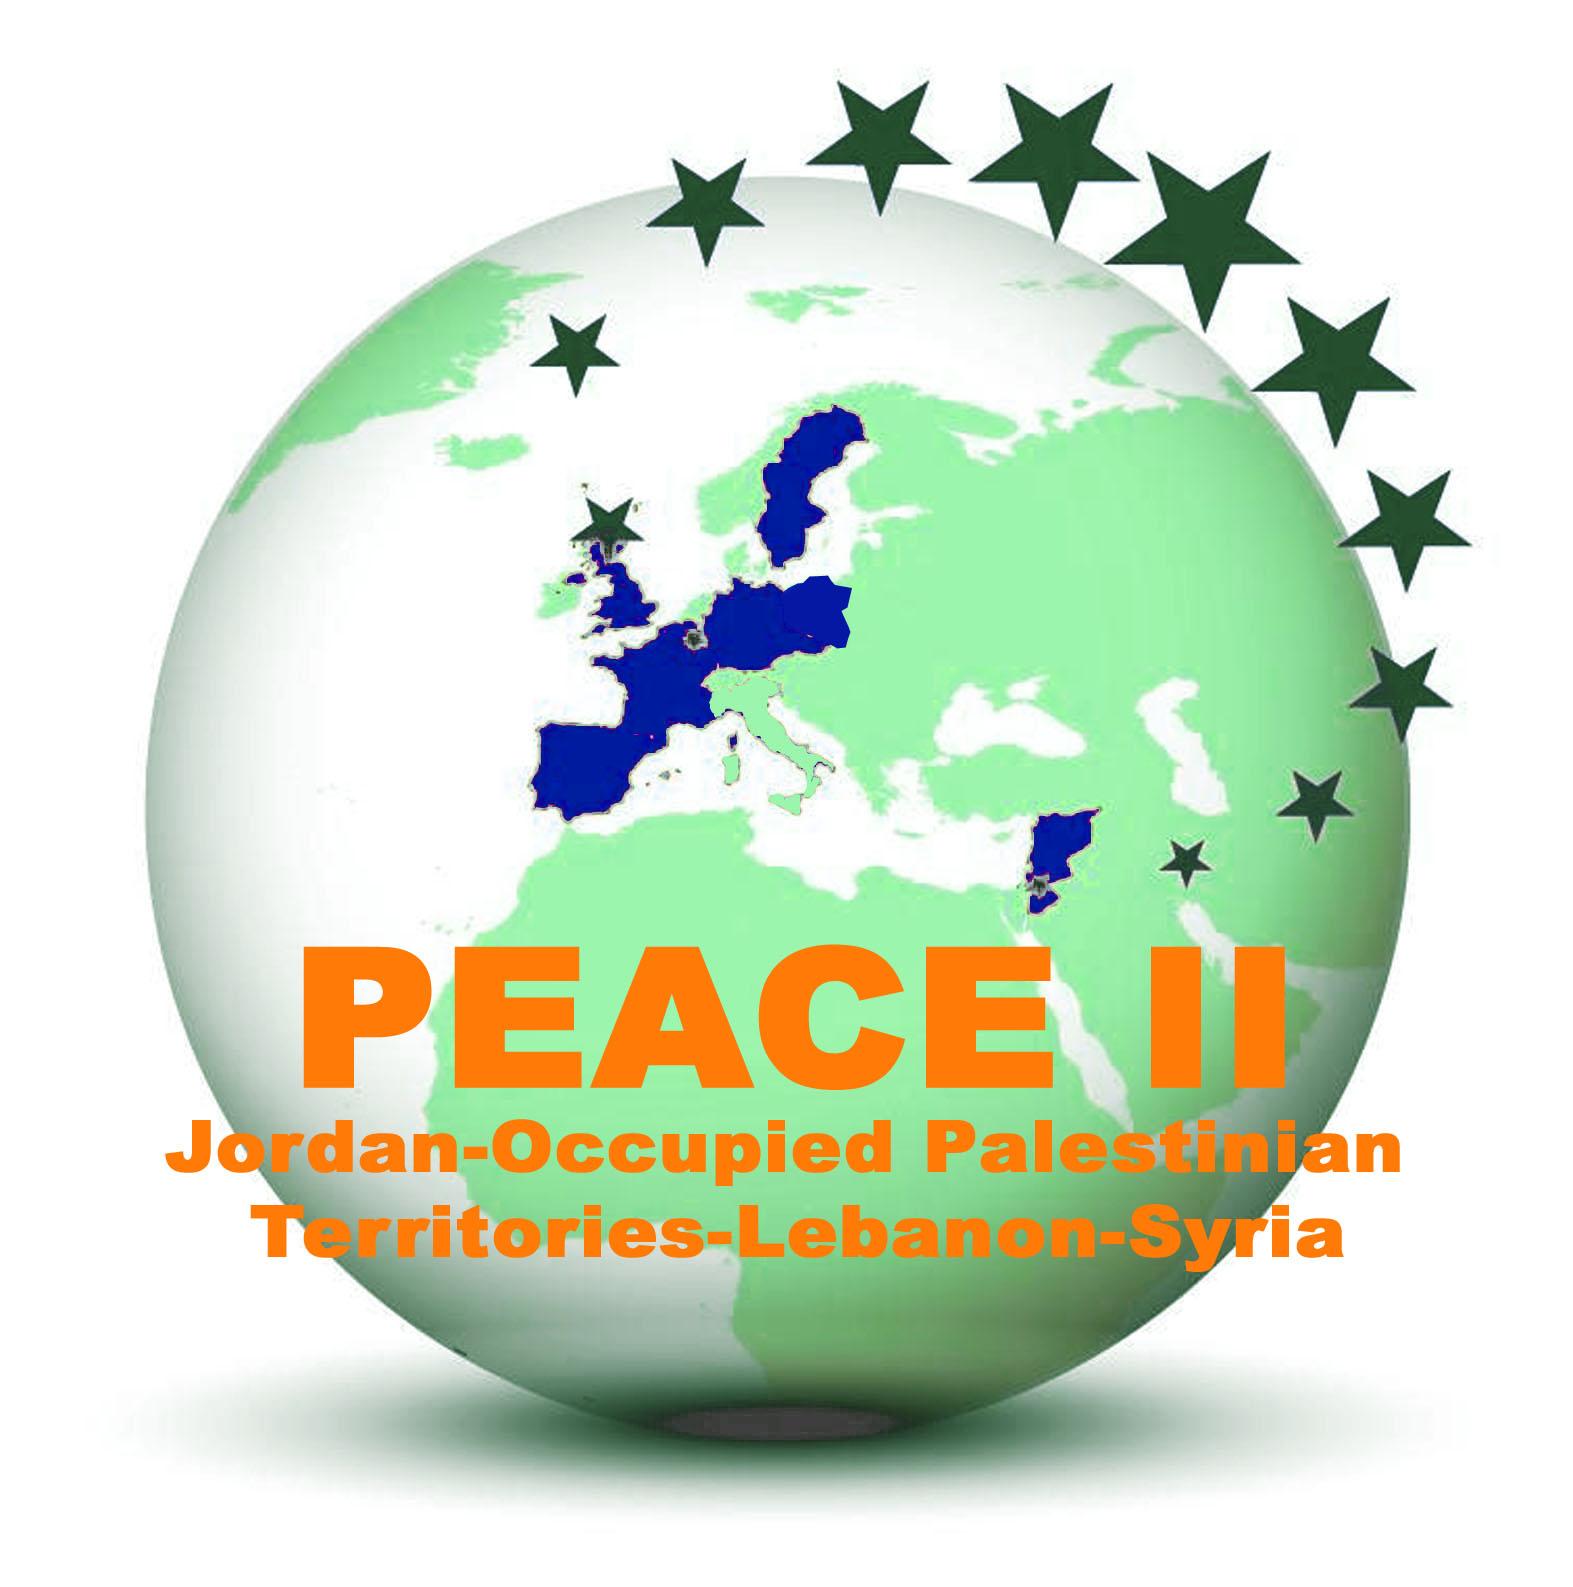 Logo of PEACEII